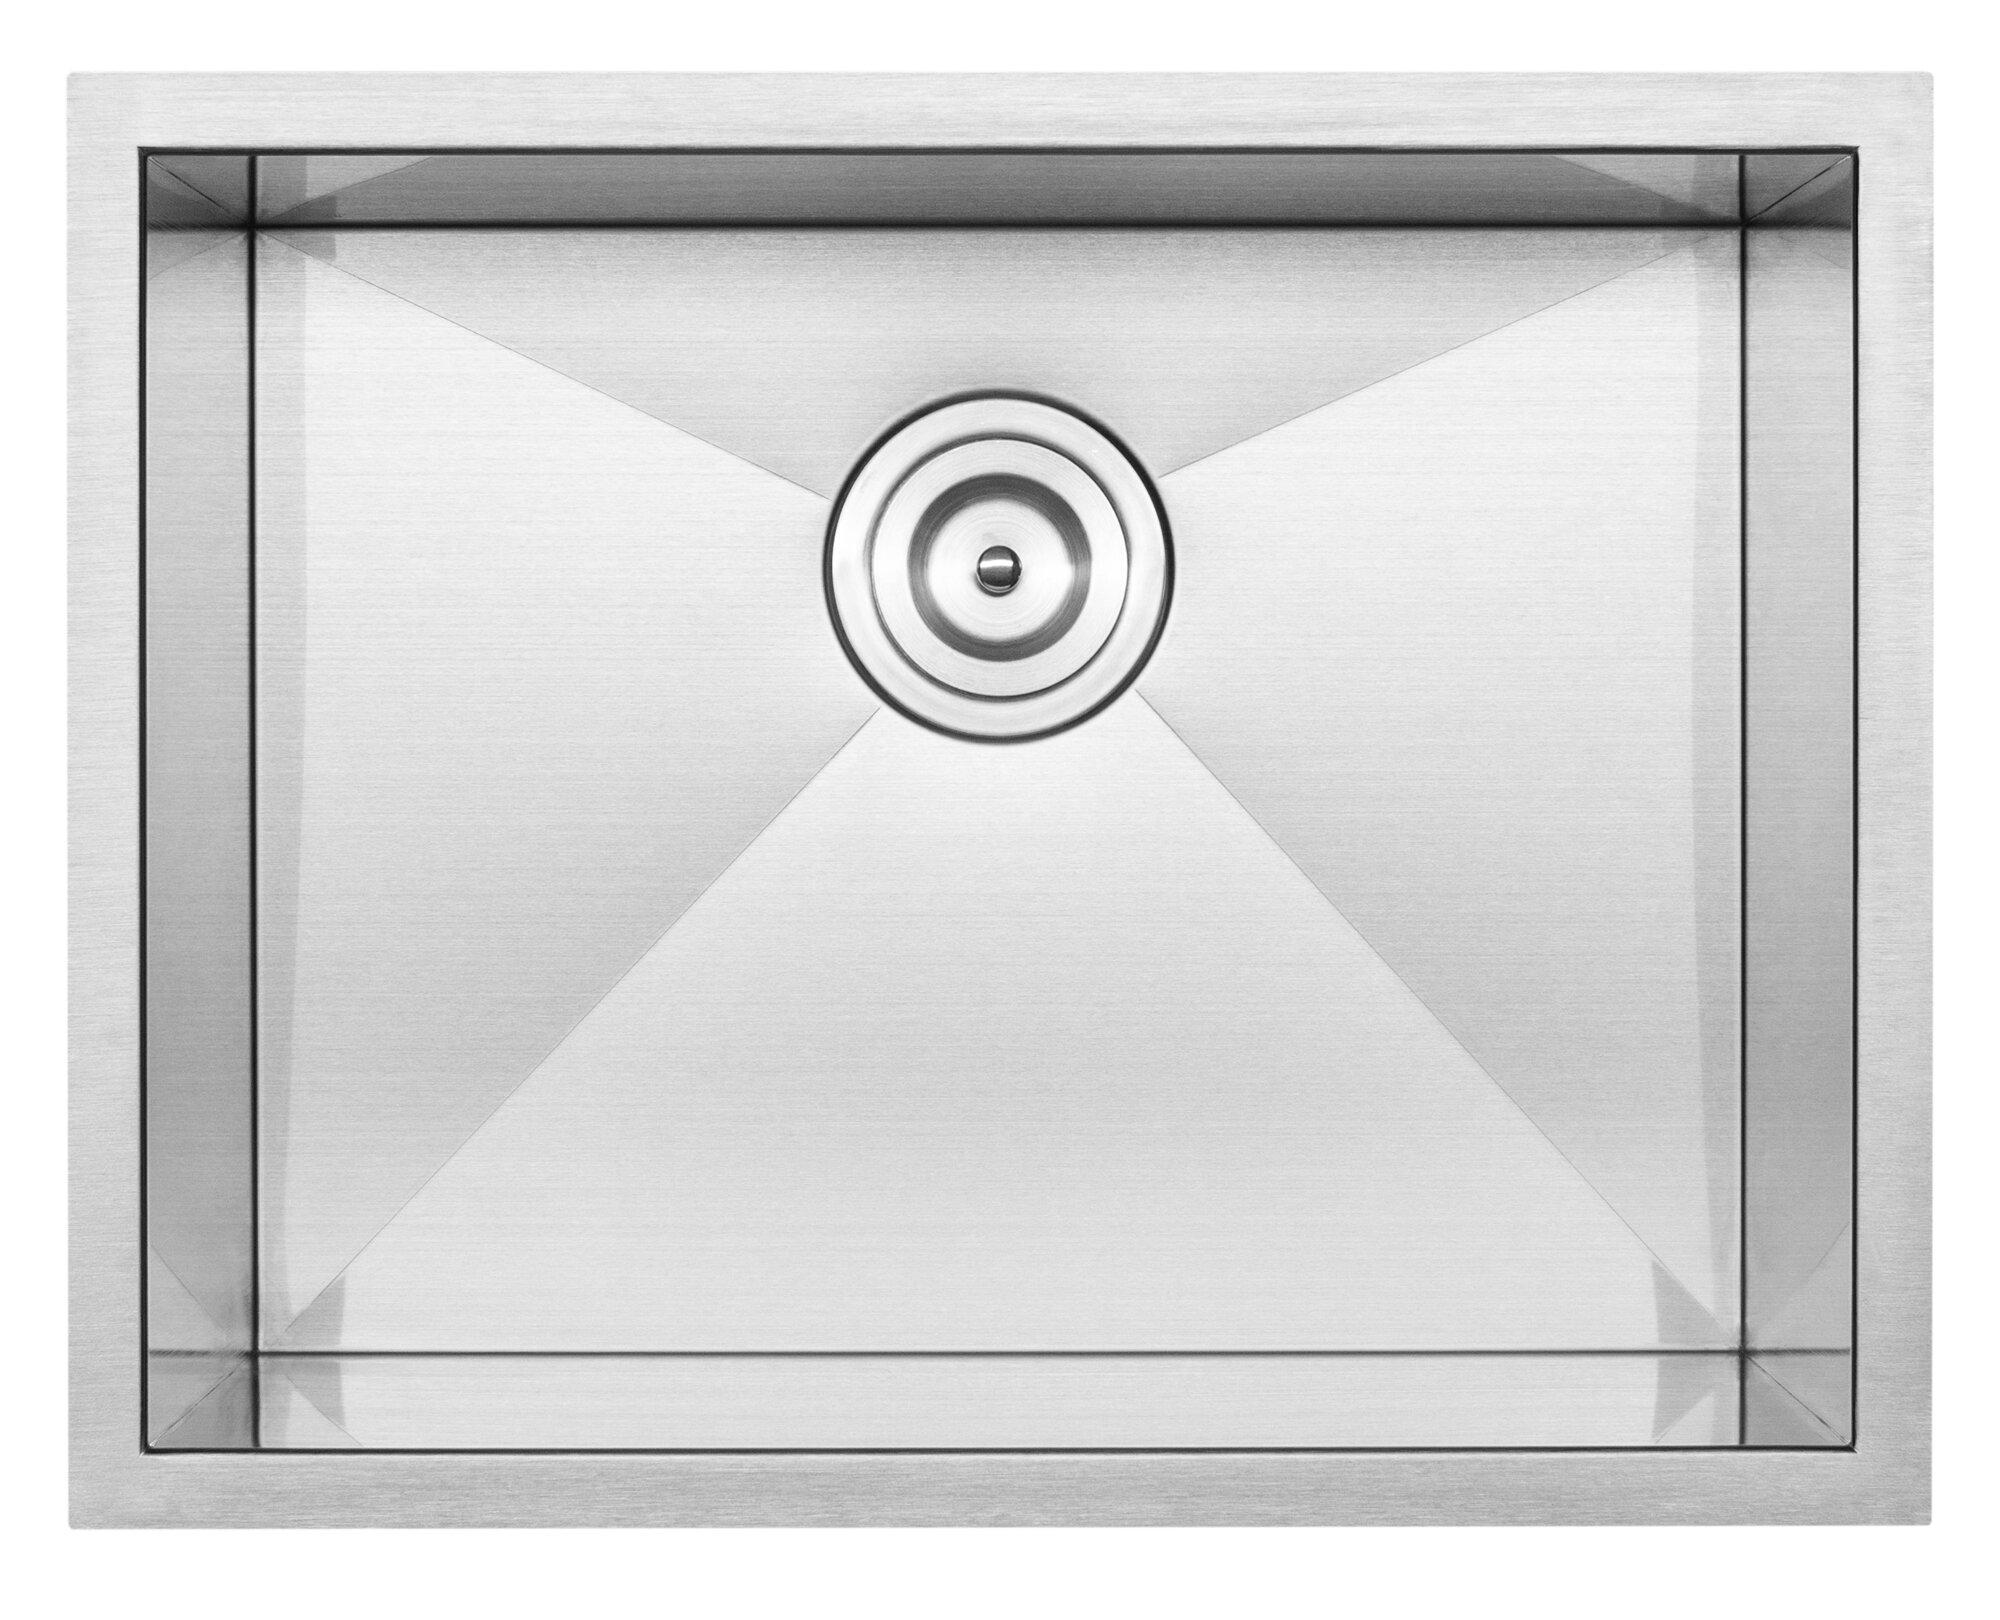 Hand Crafted Rectangular Pacific Granite Stainless Steel 16 Gauge Undermount Sink 50//50 Double Bowl Premium